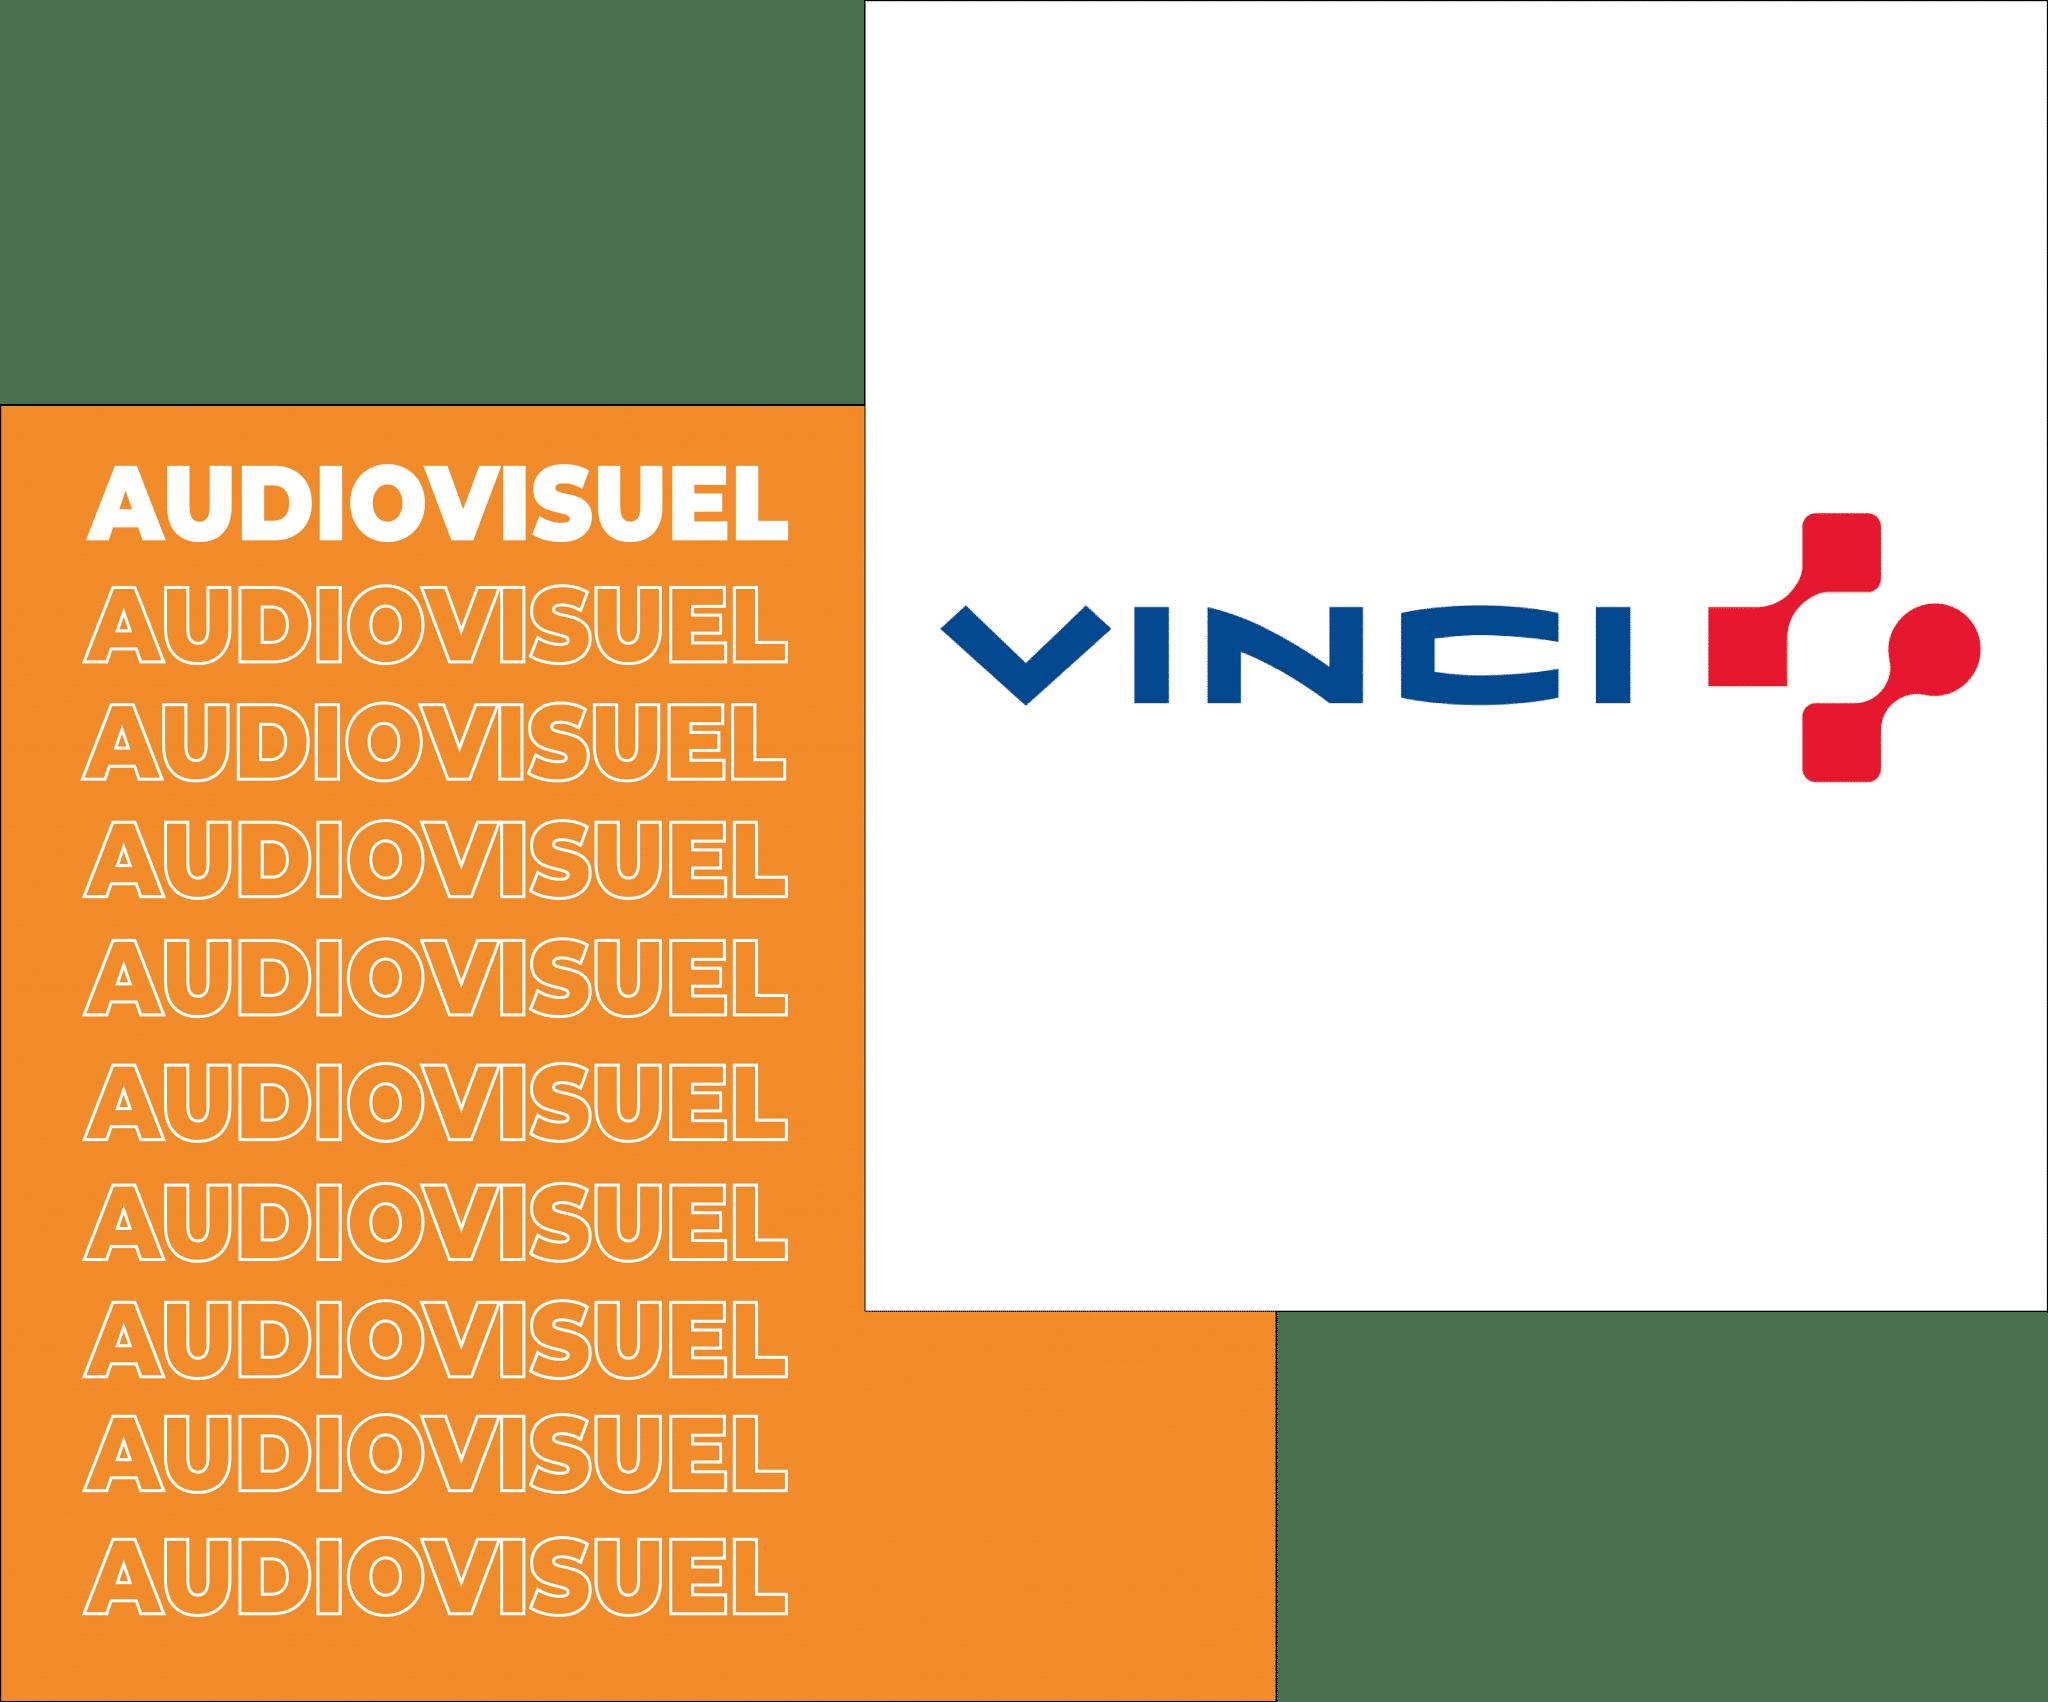 Audiovisuel - Vinci I Arkham Studio - agence de gamification